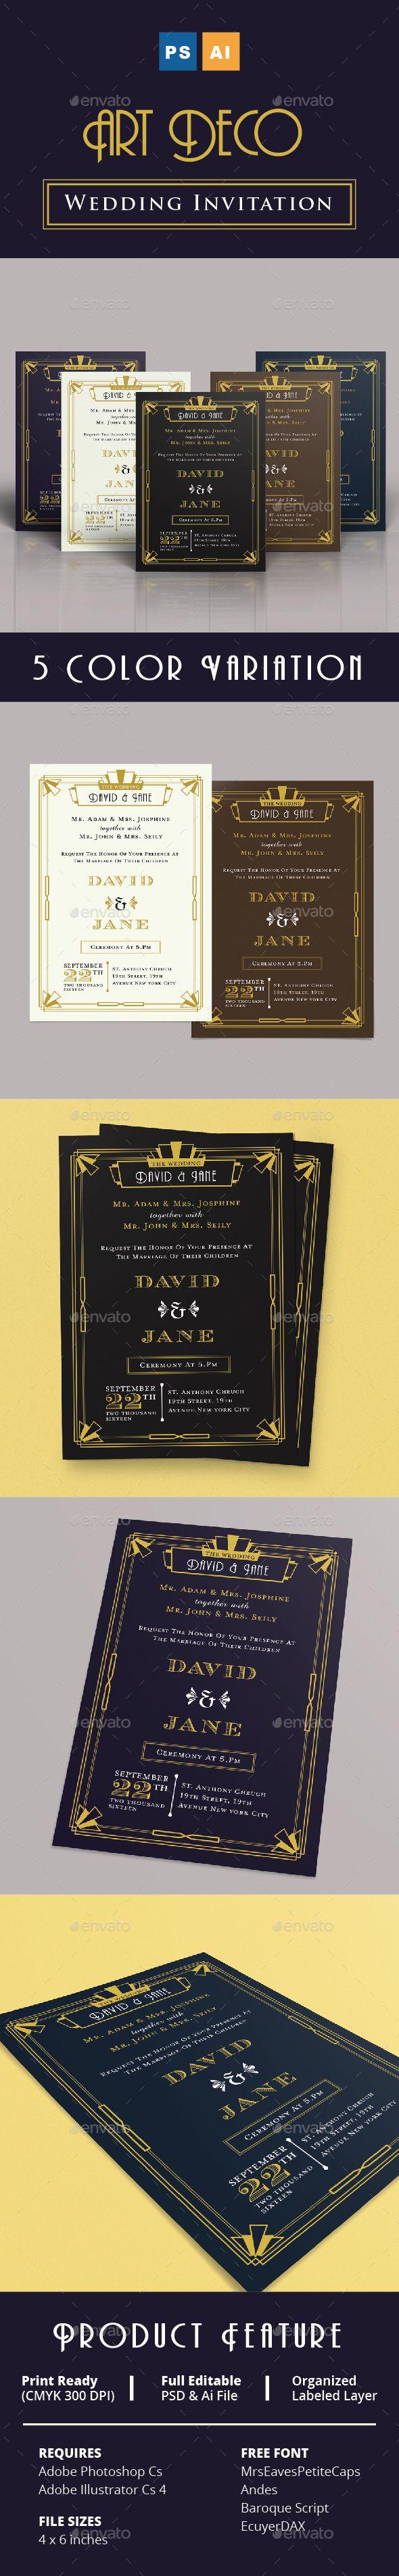 marriage invitation sms on mobile%0A Art Deco Wedding Invitation